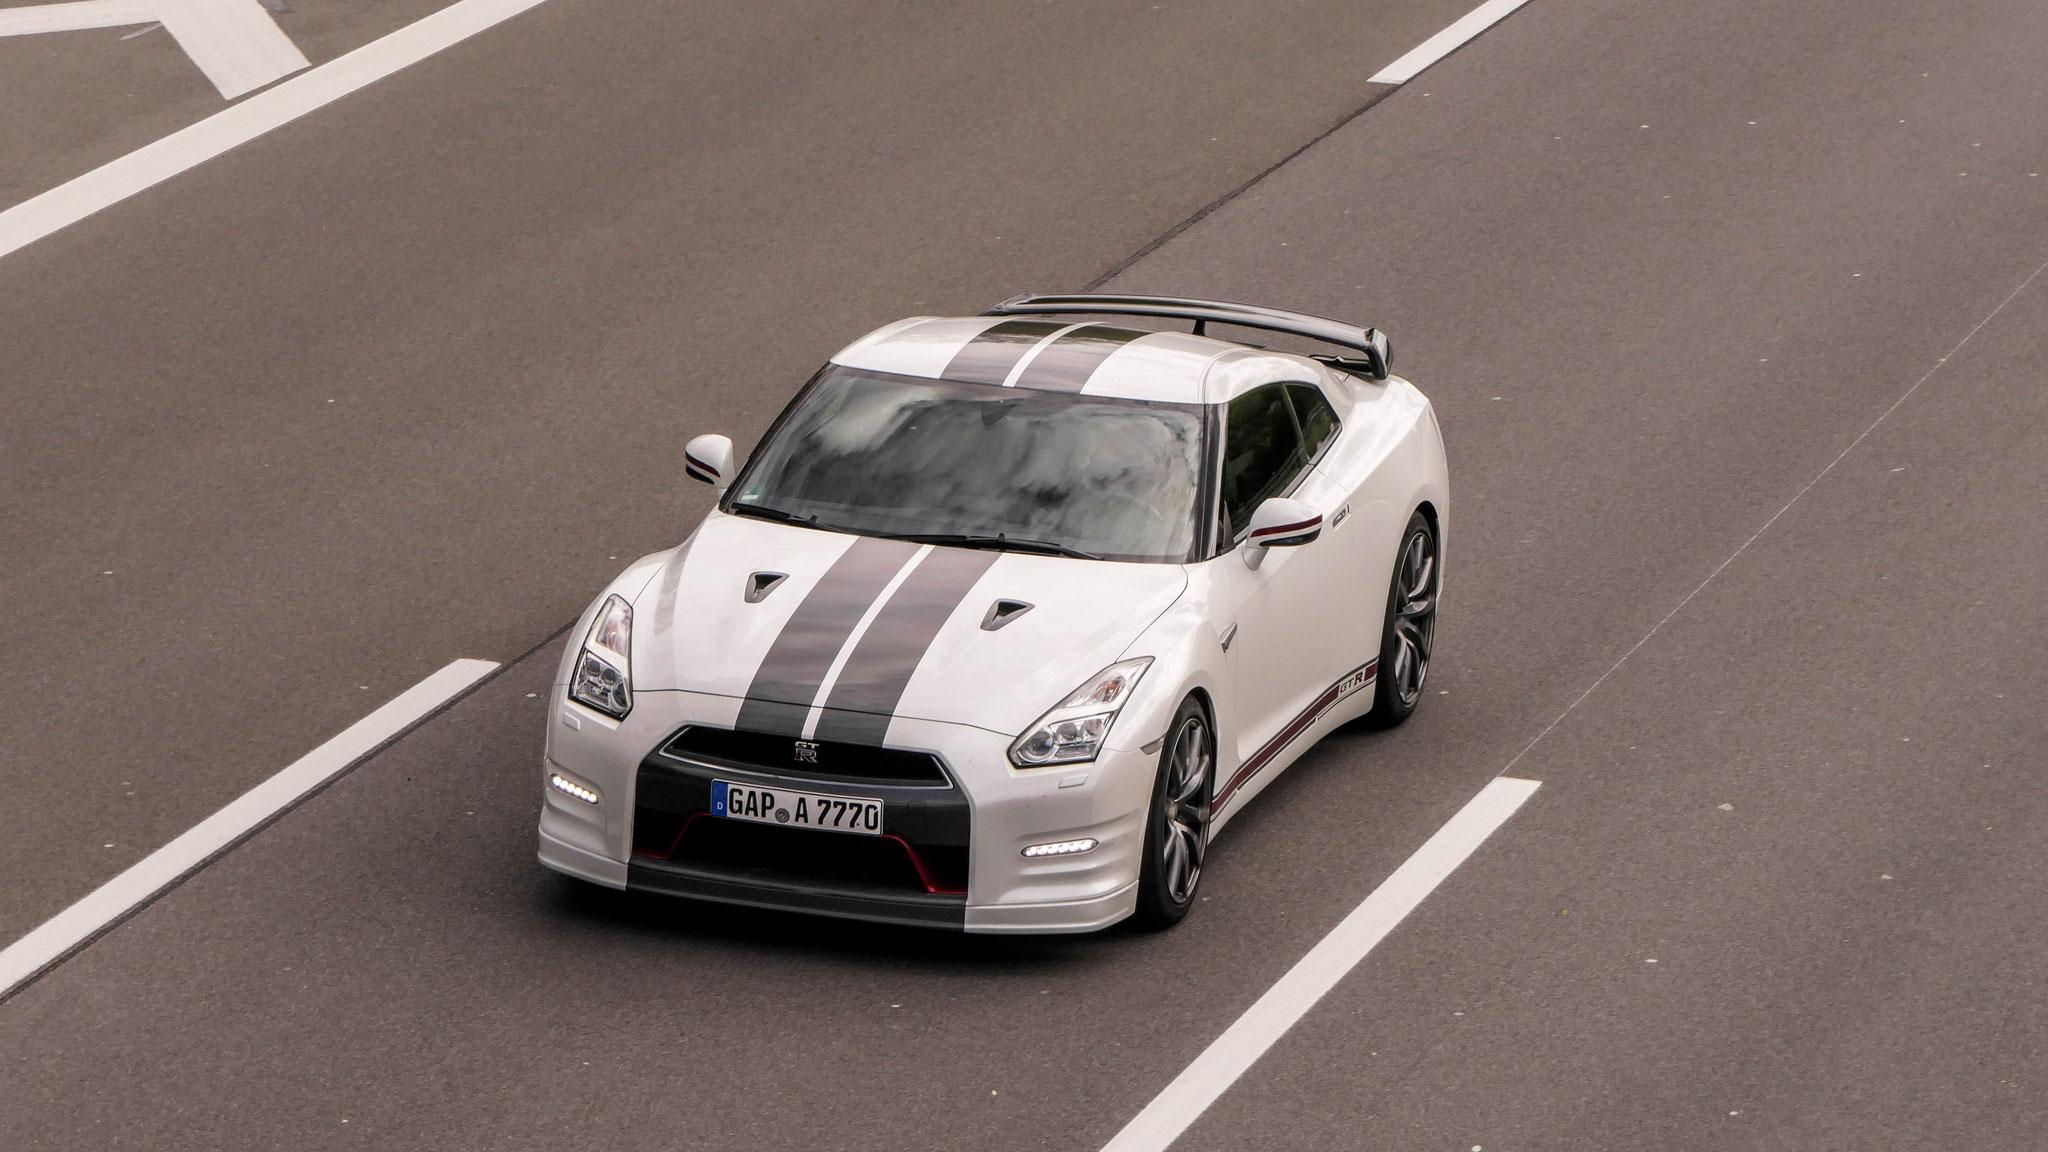 Nissan GTR - GAP-A-7770